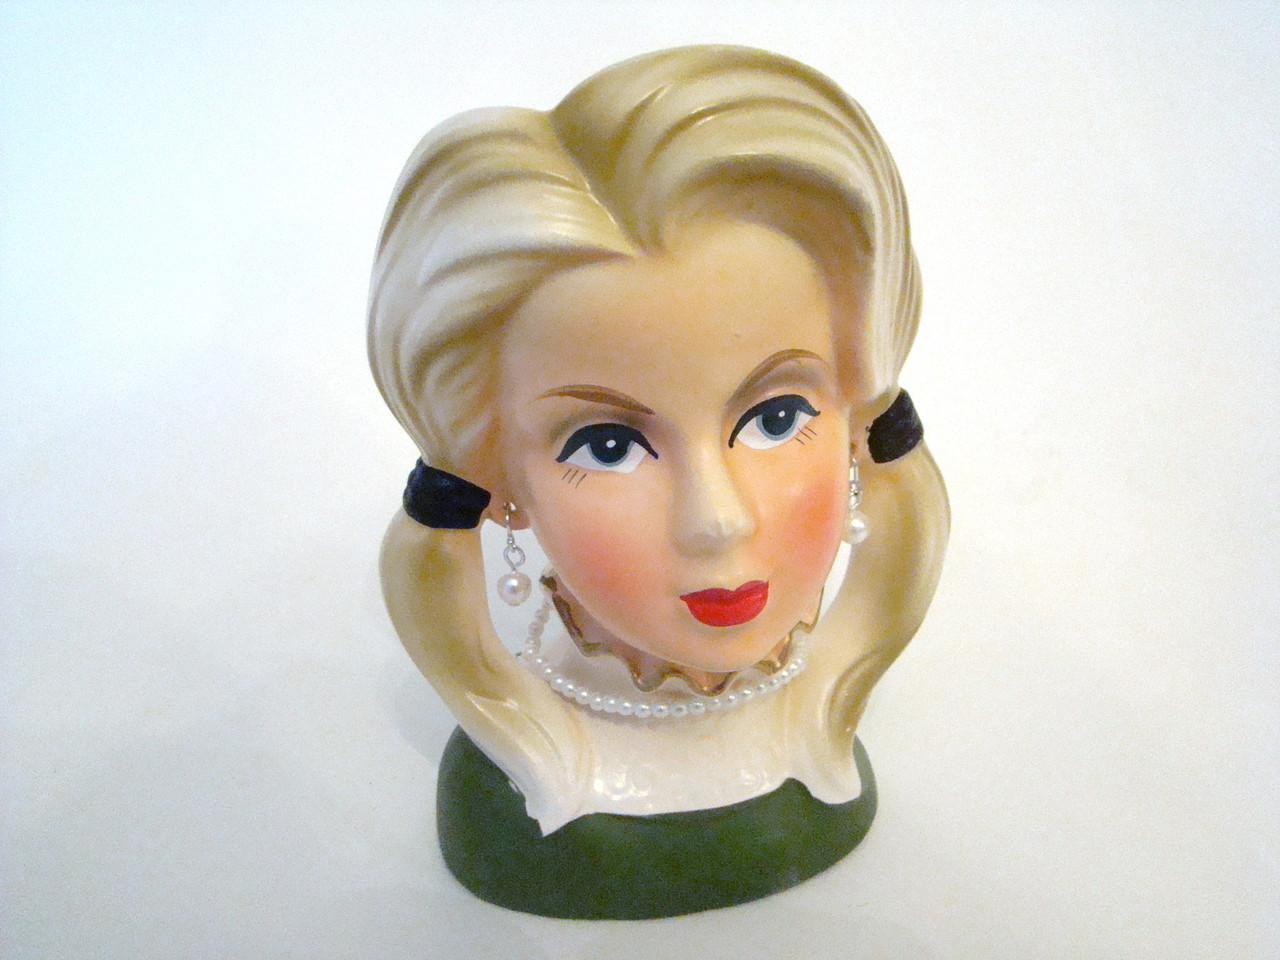 Vintage Lady Head Vase SET of 3 JAPAN Rubens 4129